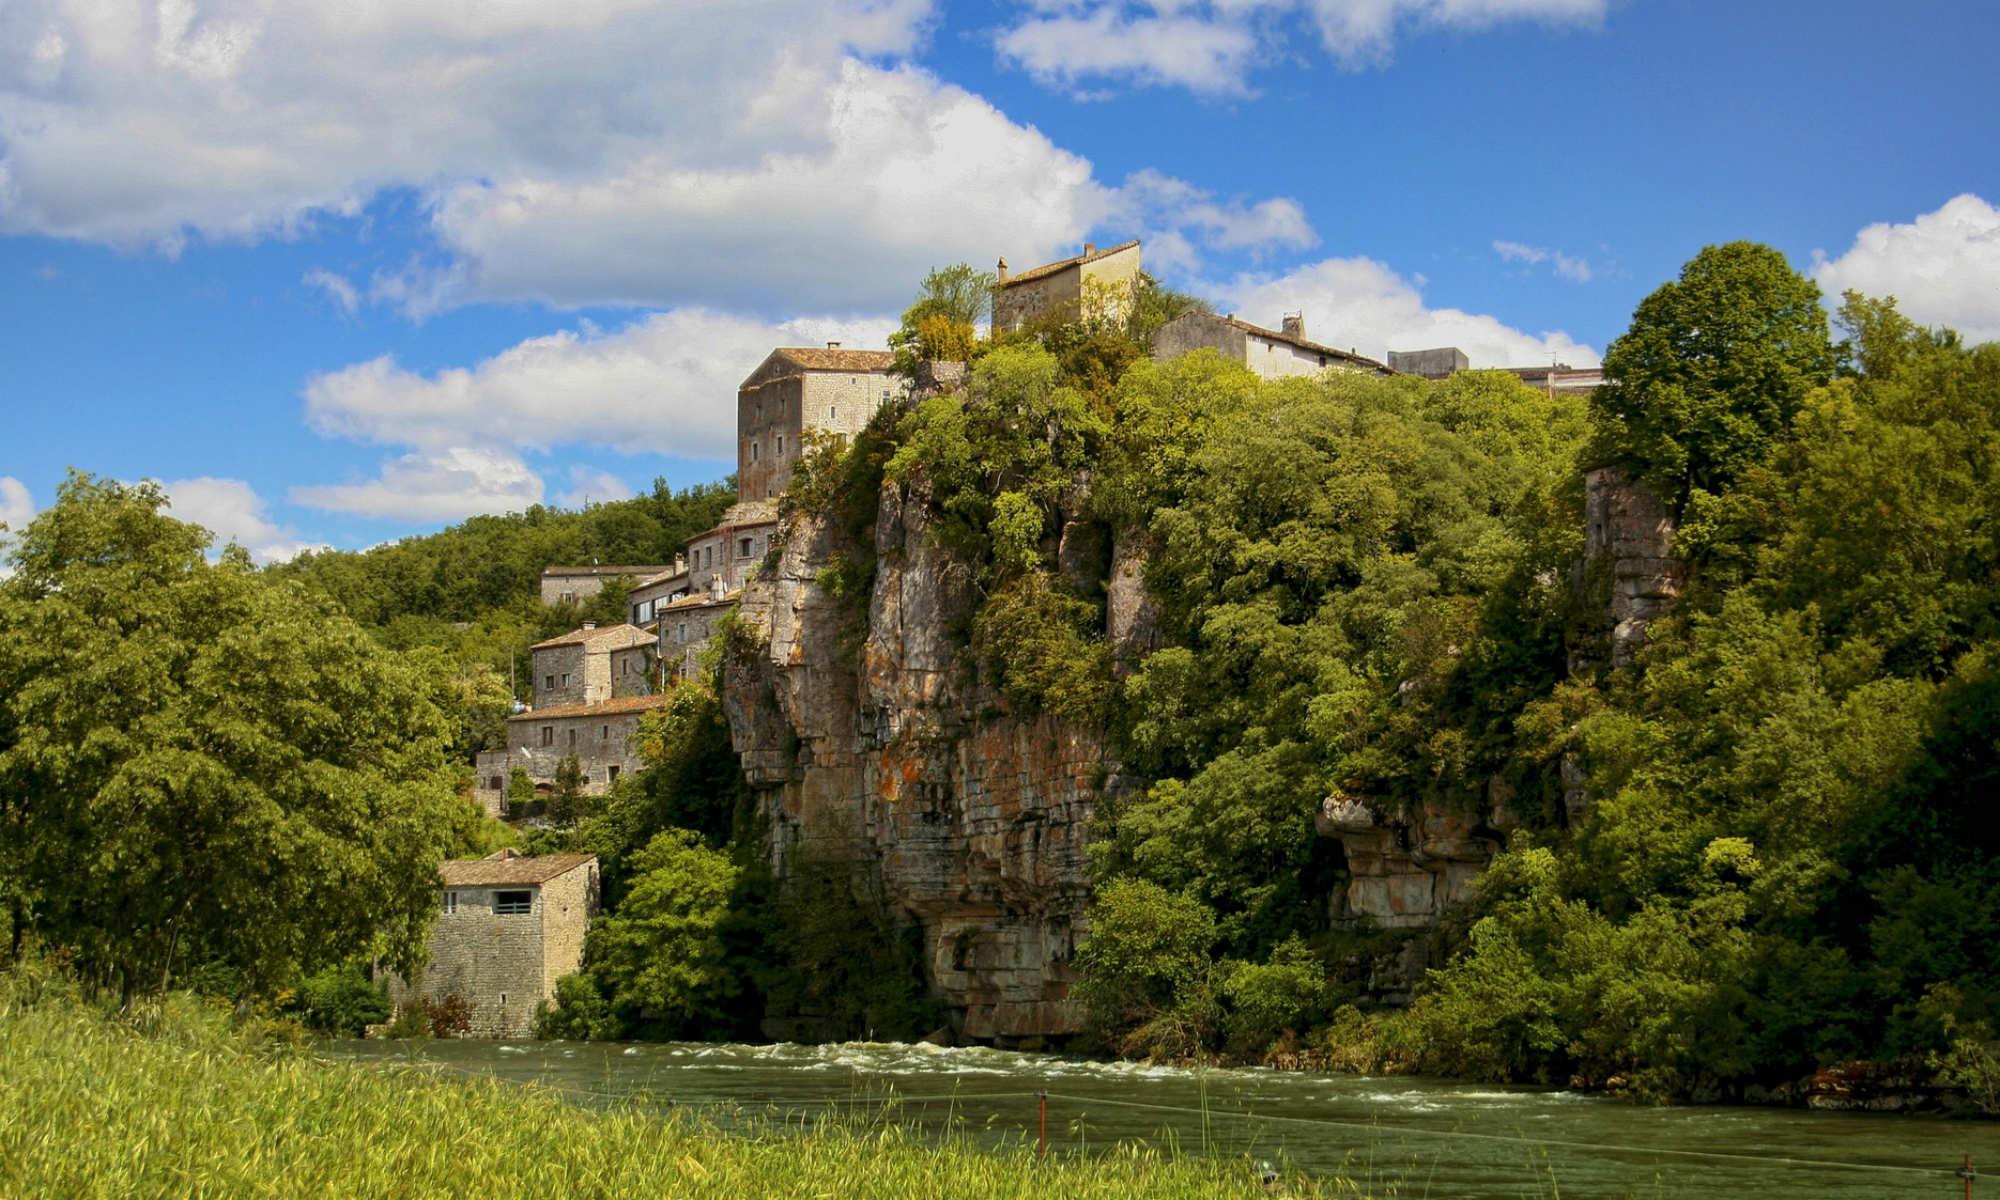 Le village de Balazuc en Ardèche.